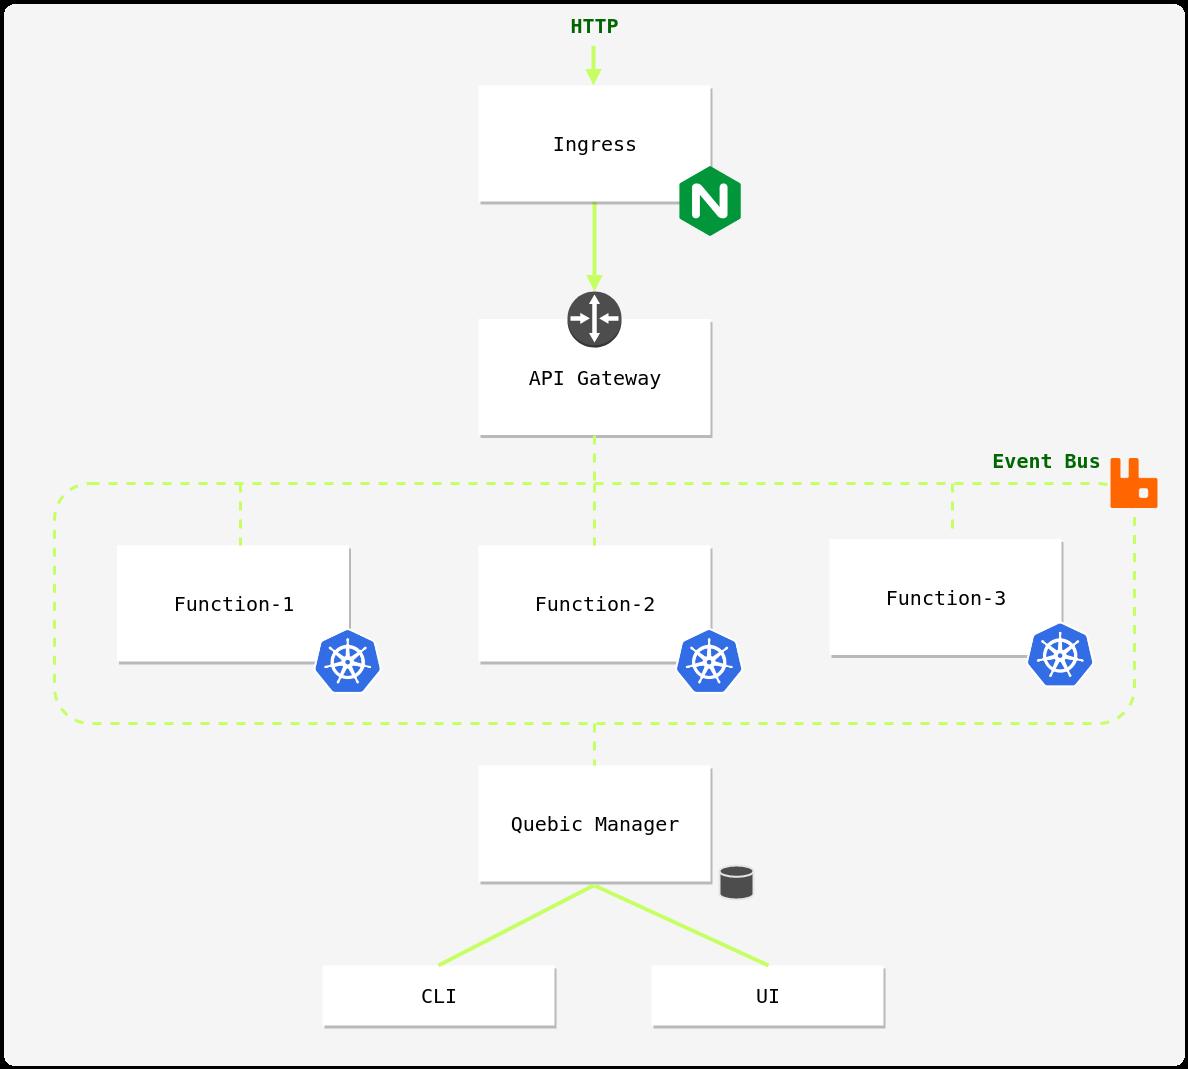 /getting-started-quebic-faas-framework-c05ca0e13e08 feature image